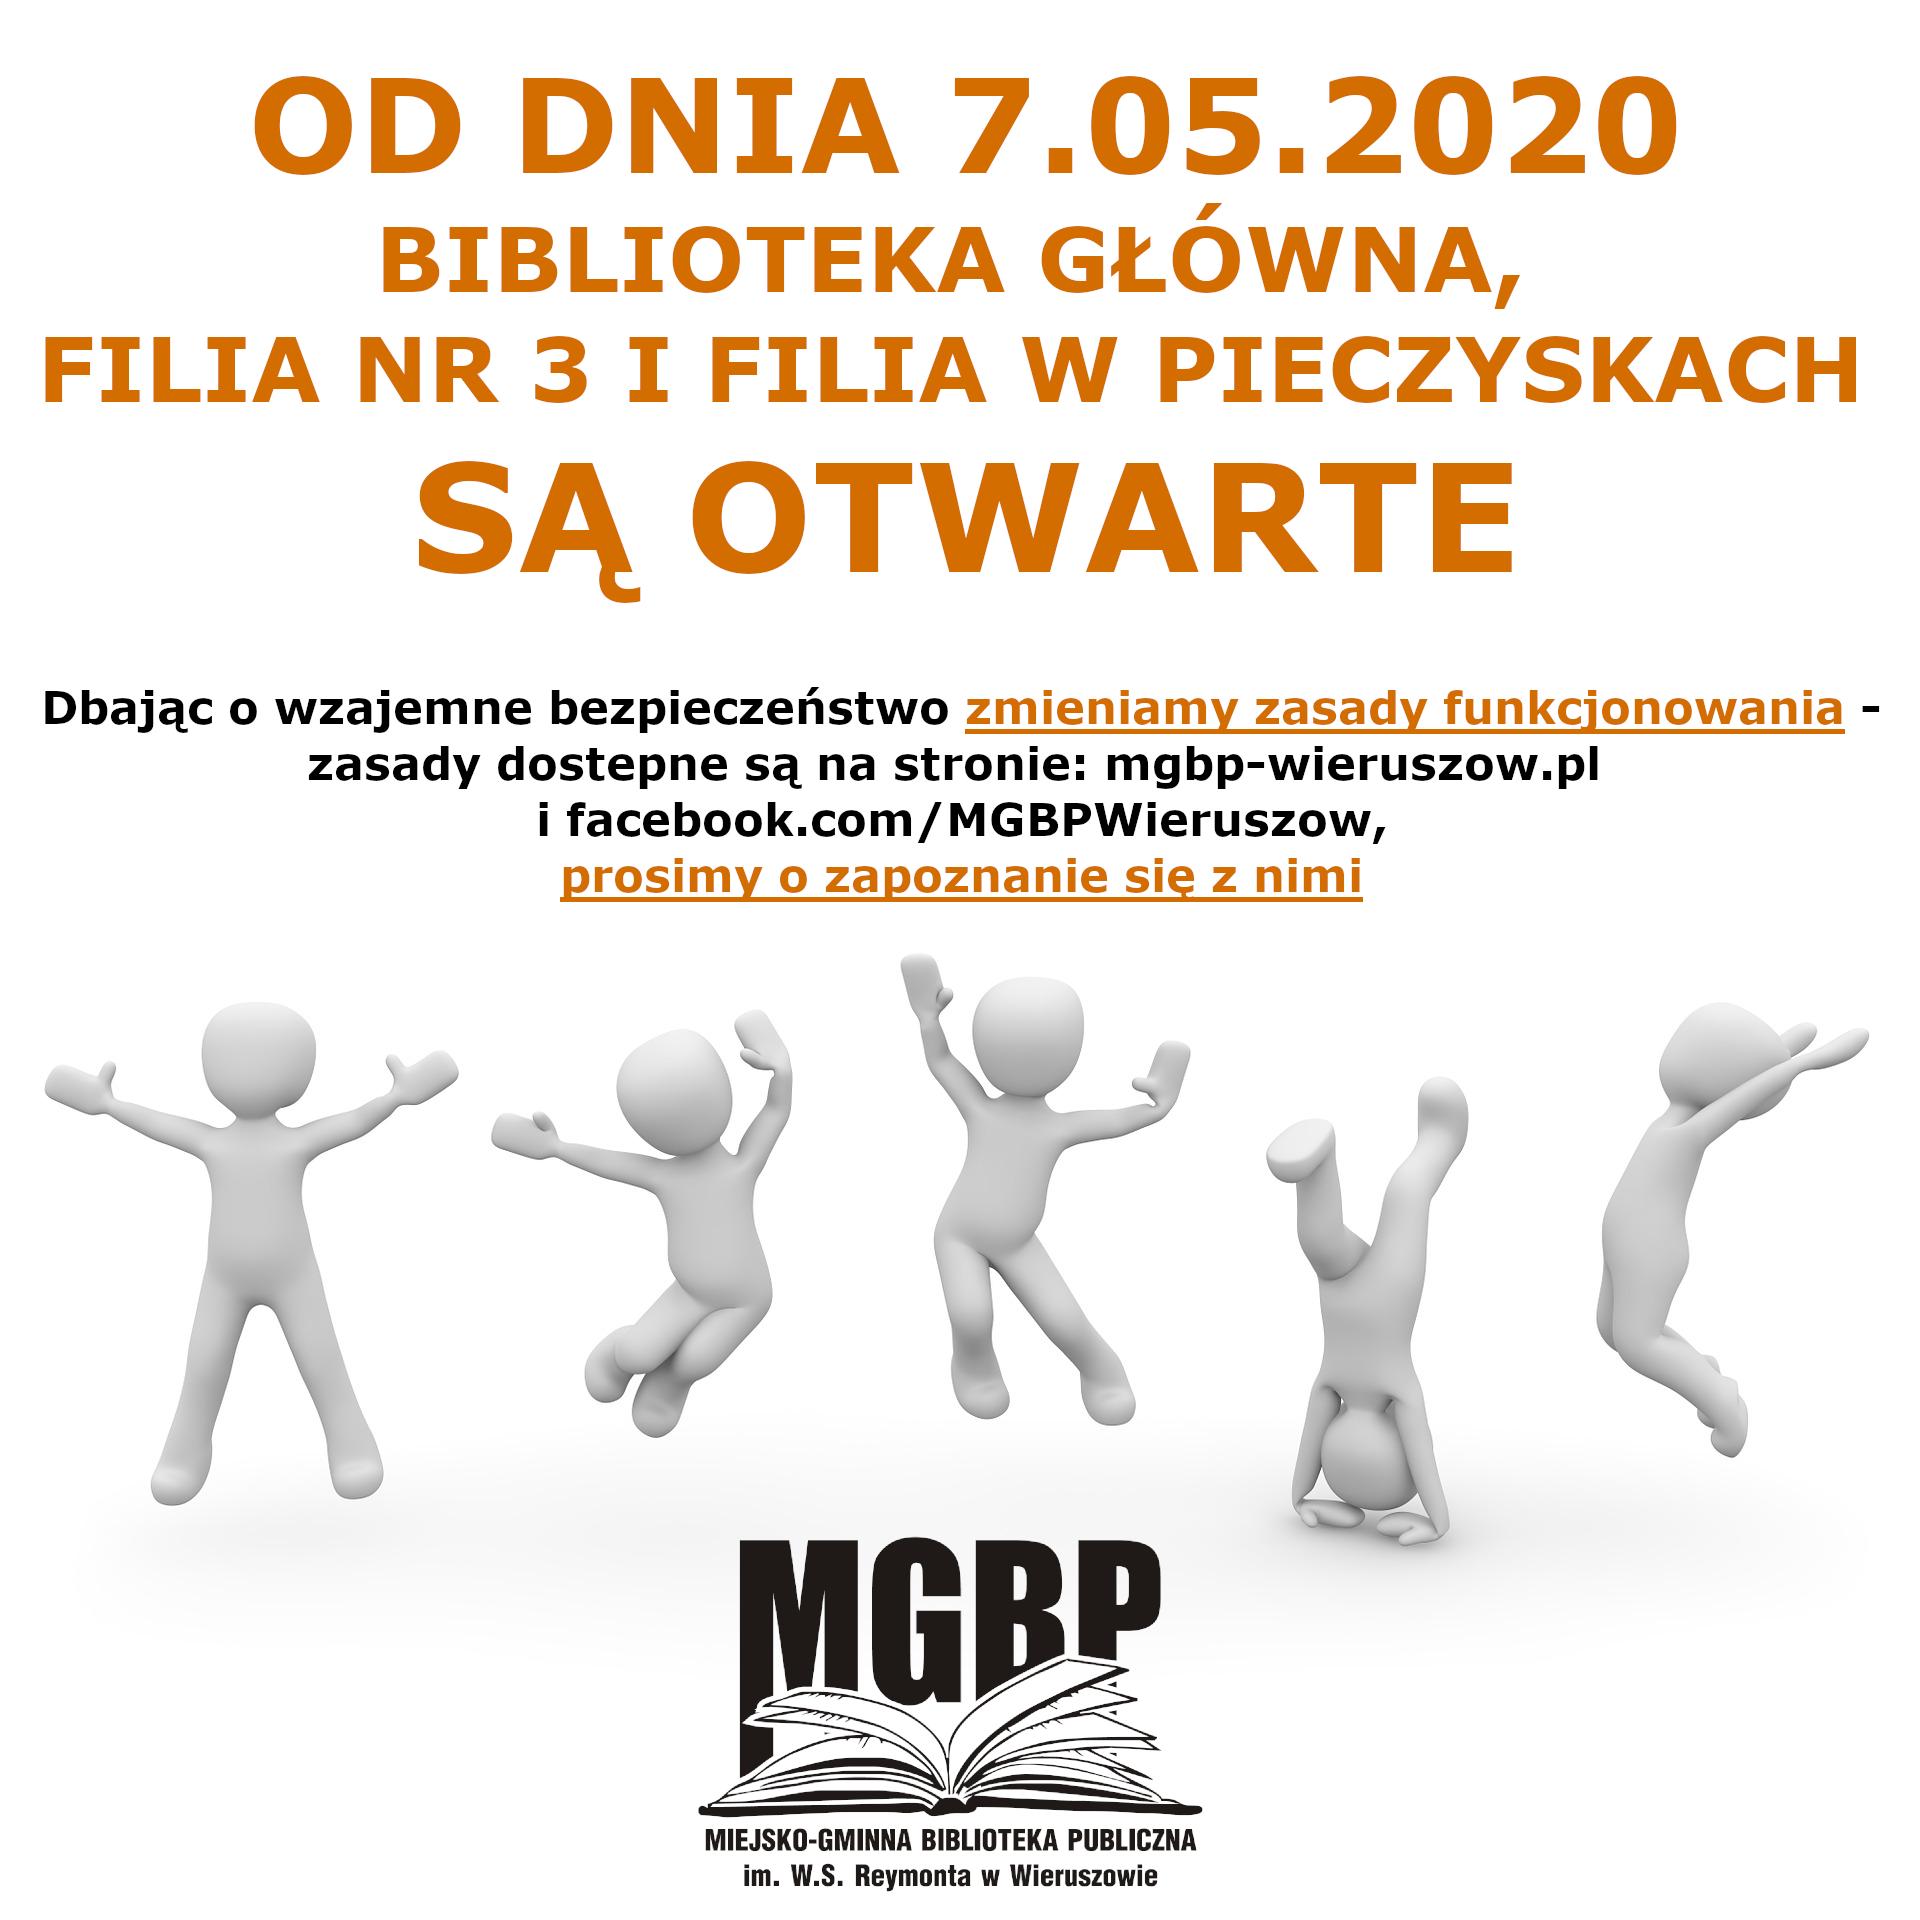 BIBLIOTEKA OTWARTA OD 7.05.2020